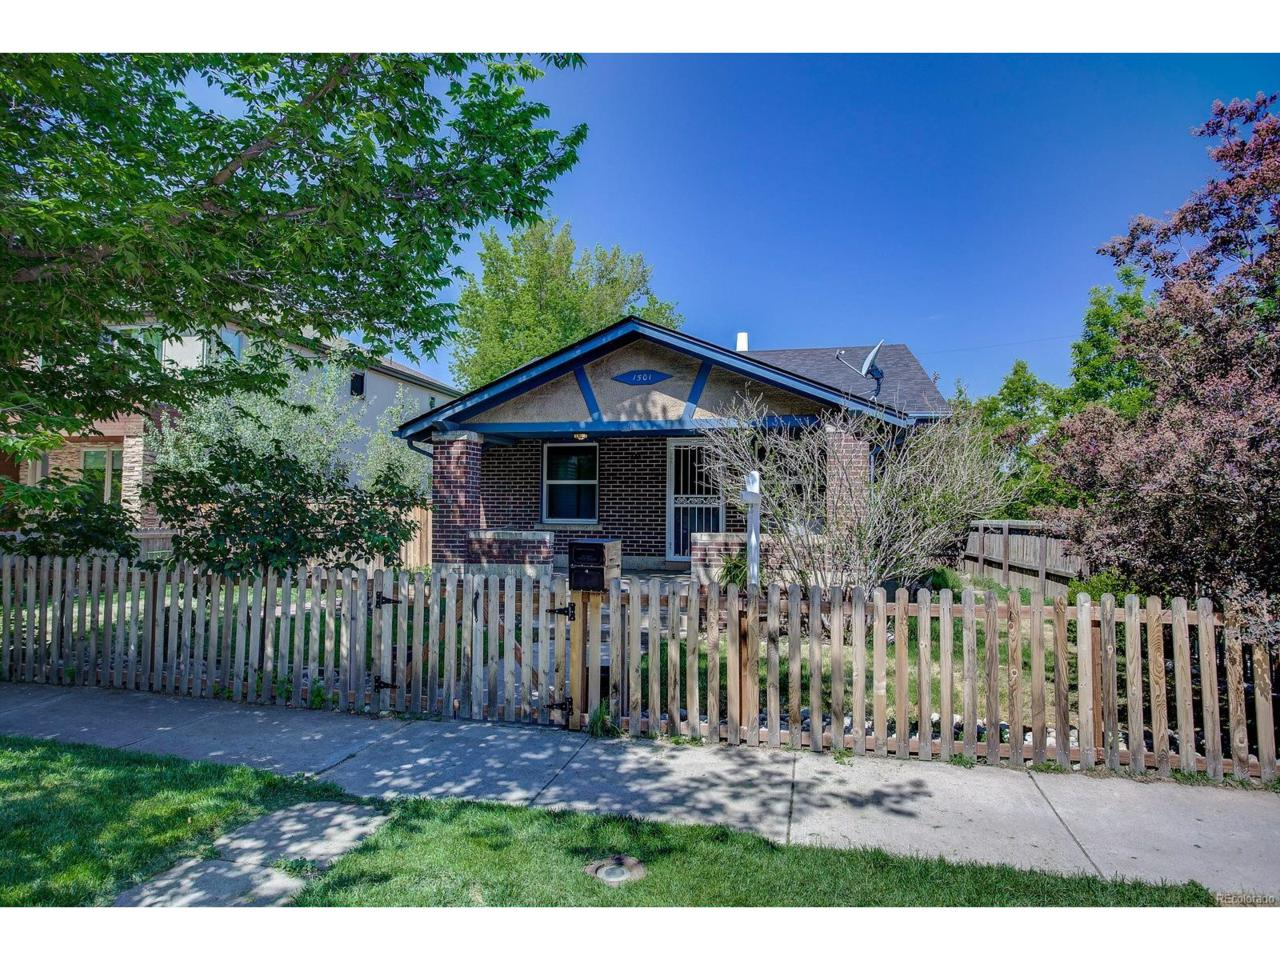 1501 S Pennsylvania Street, Denver, CO 80210 (MLS #4369113) :: 8z Real Estate